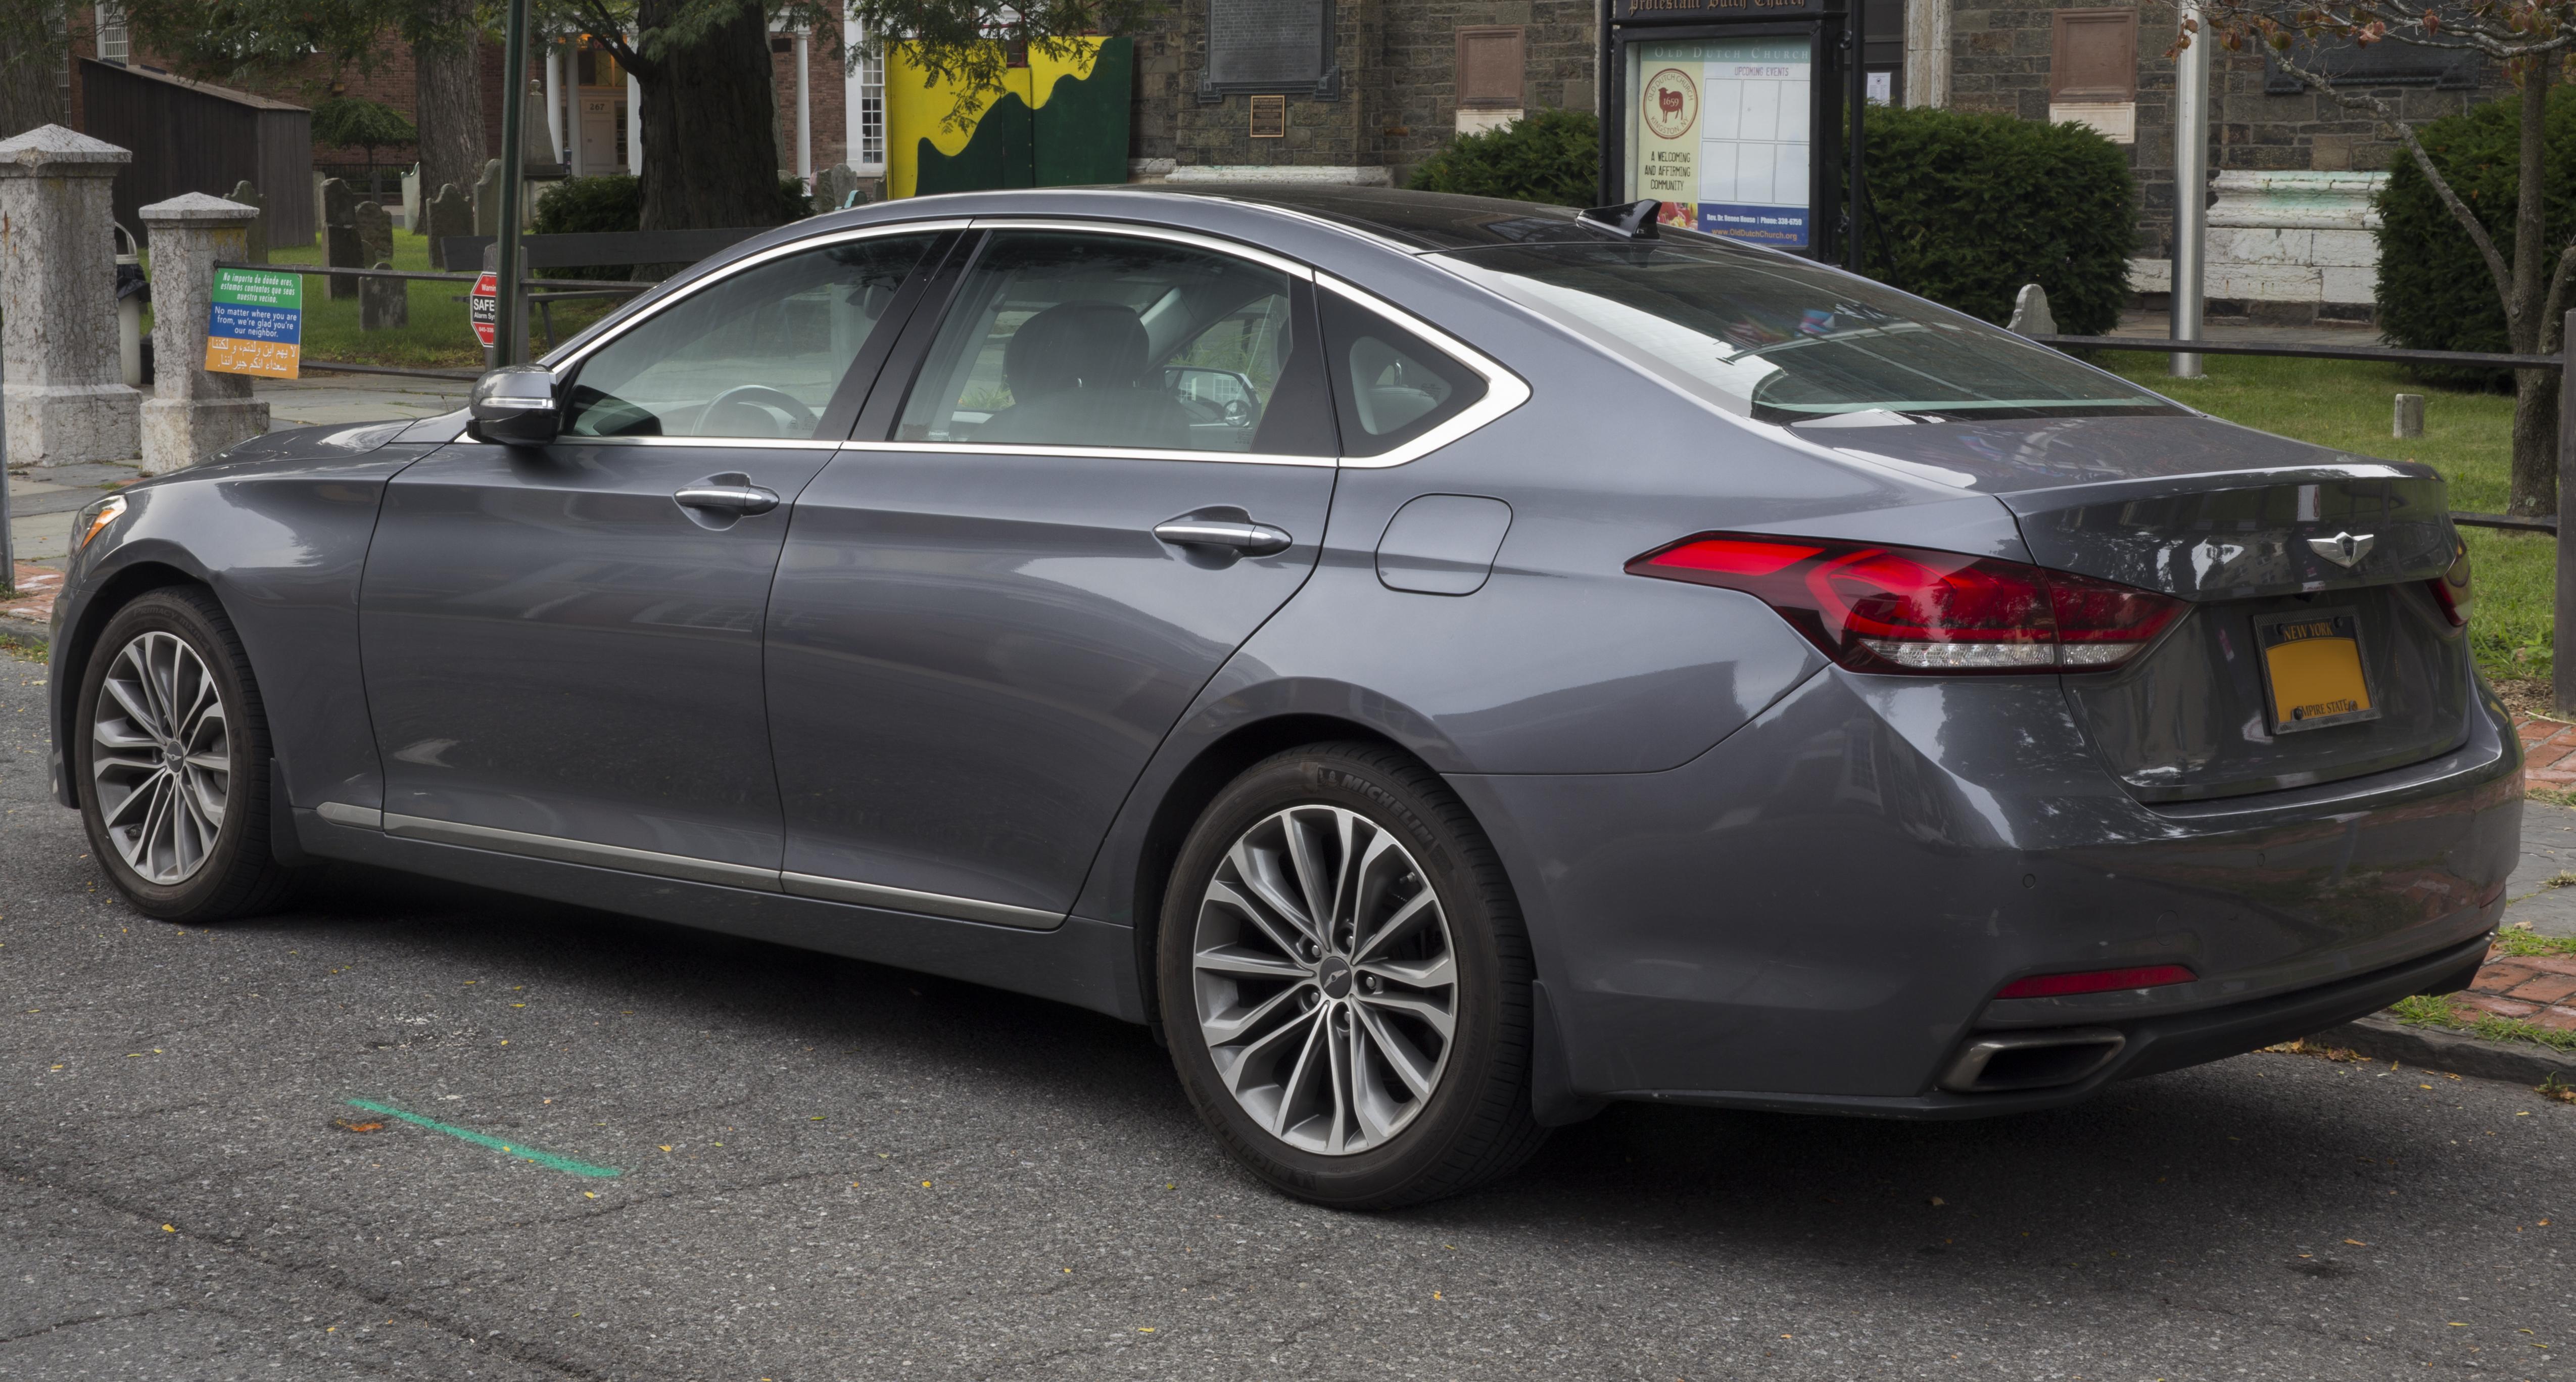 File 2015 Hyundai Genesis 3 8 Awd In Urban Grey Metallic Rear Left Jpg Wikimedia Commons